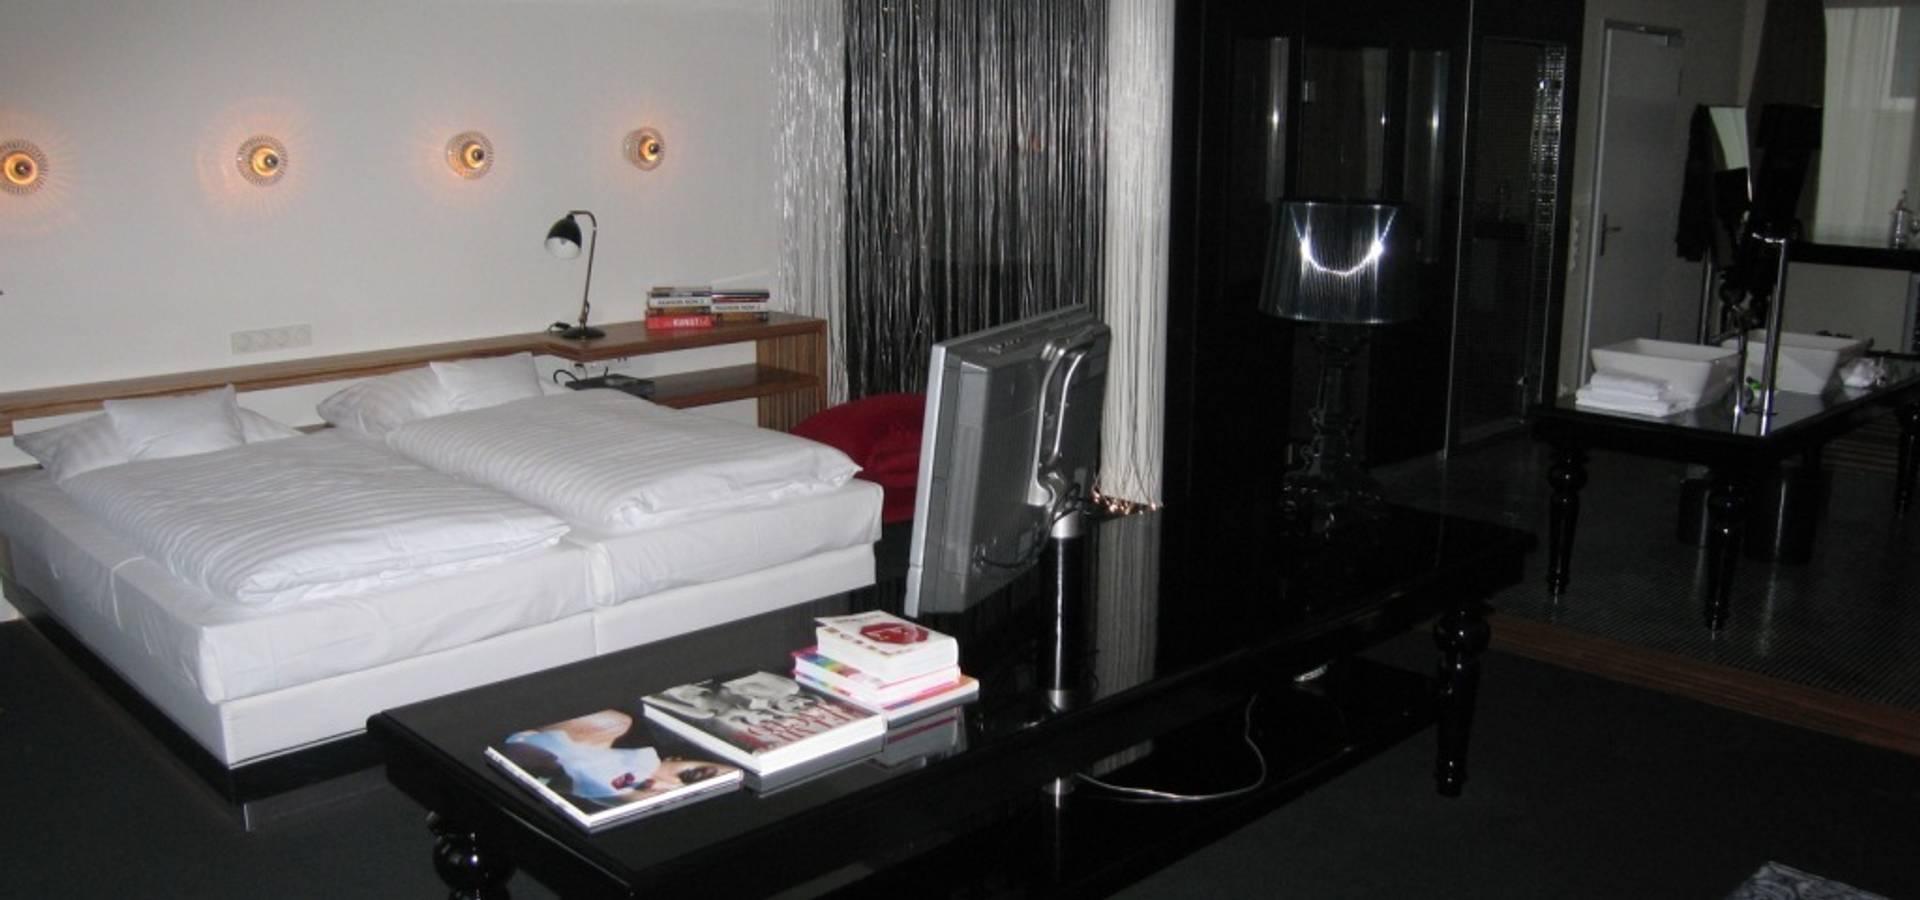 d behr elektro technik gmbh elektriker in bremen homify. Black Bedroom Furniture Sets. Home Design Ideas